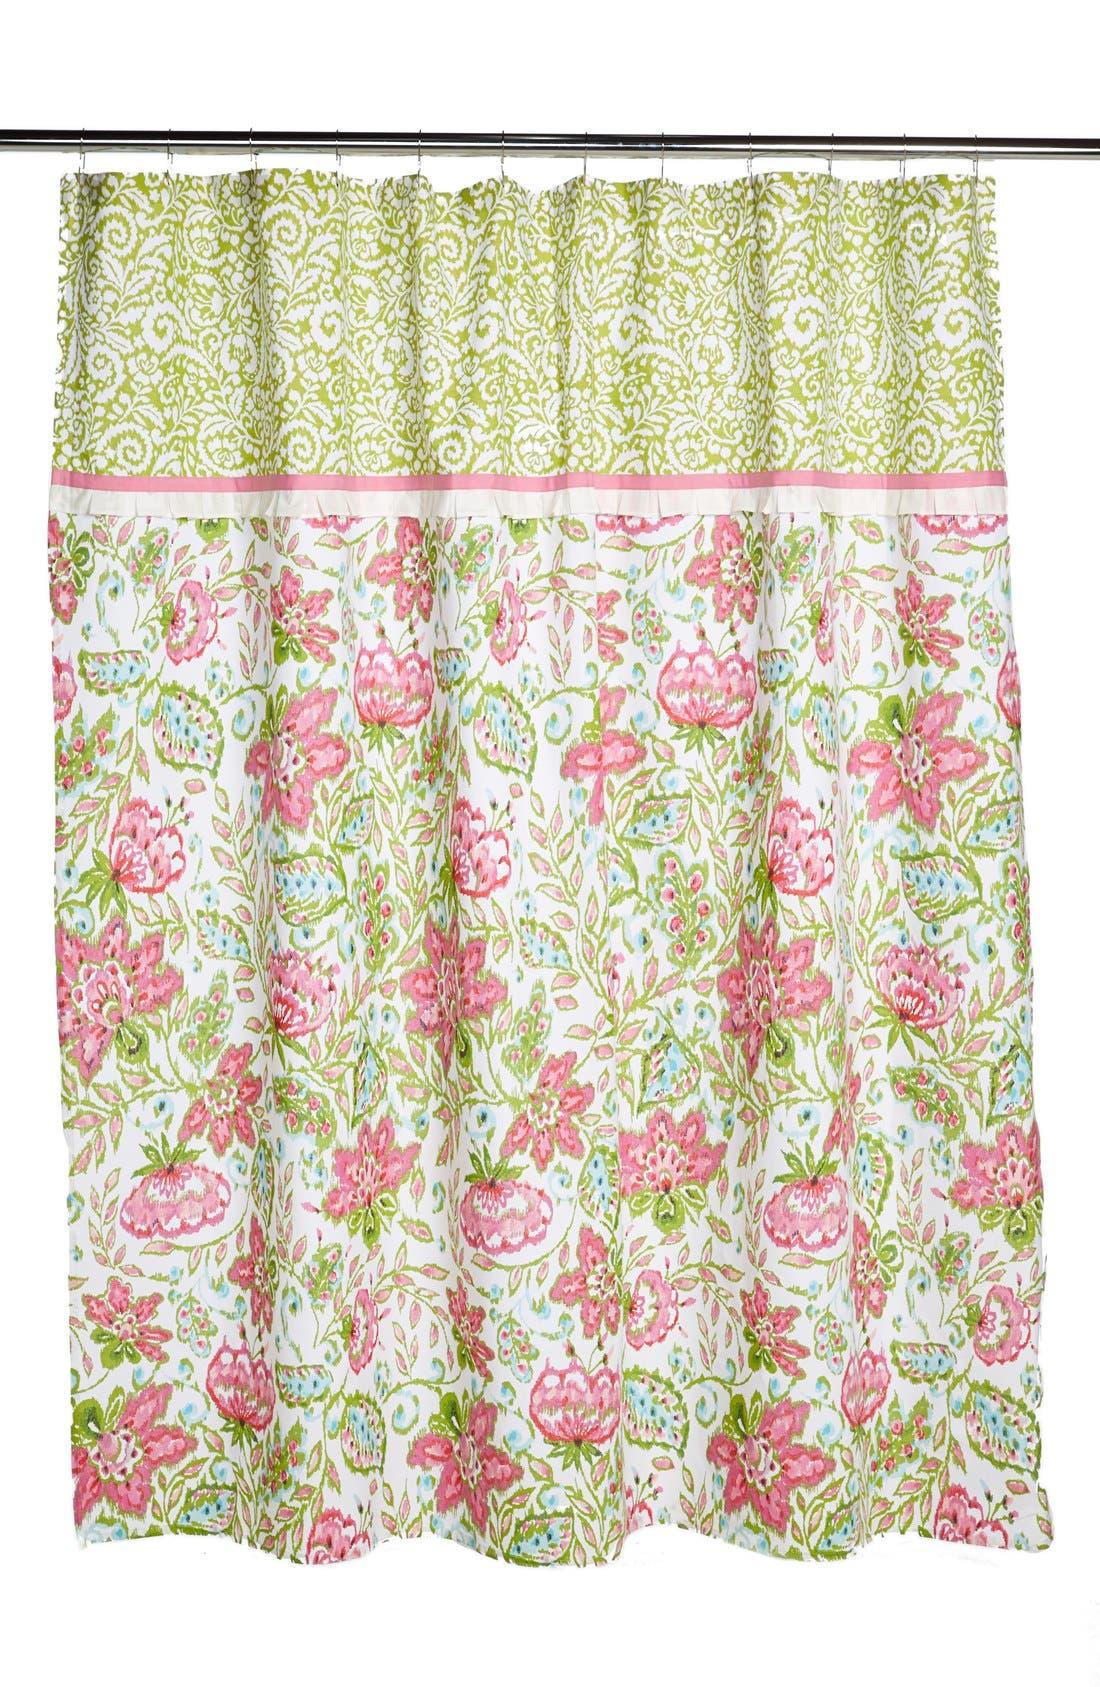 Main Image - Dena Home Paisley & Floral Print Shower Curtain